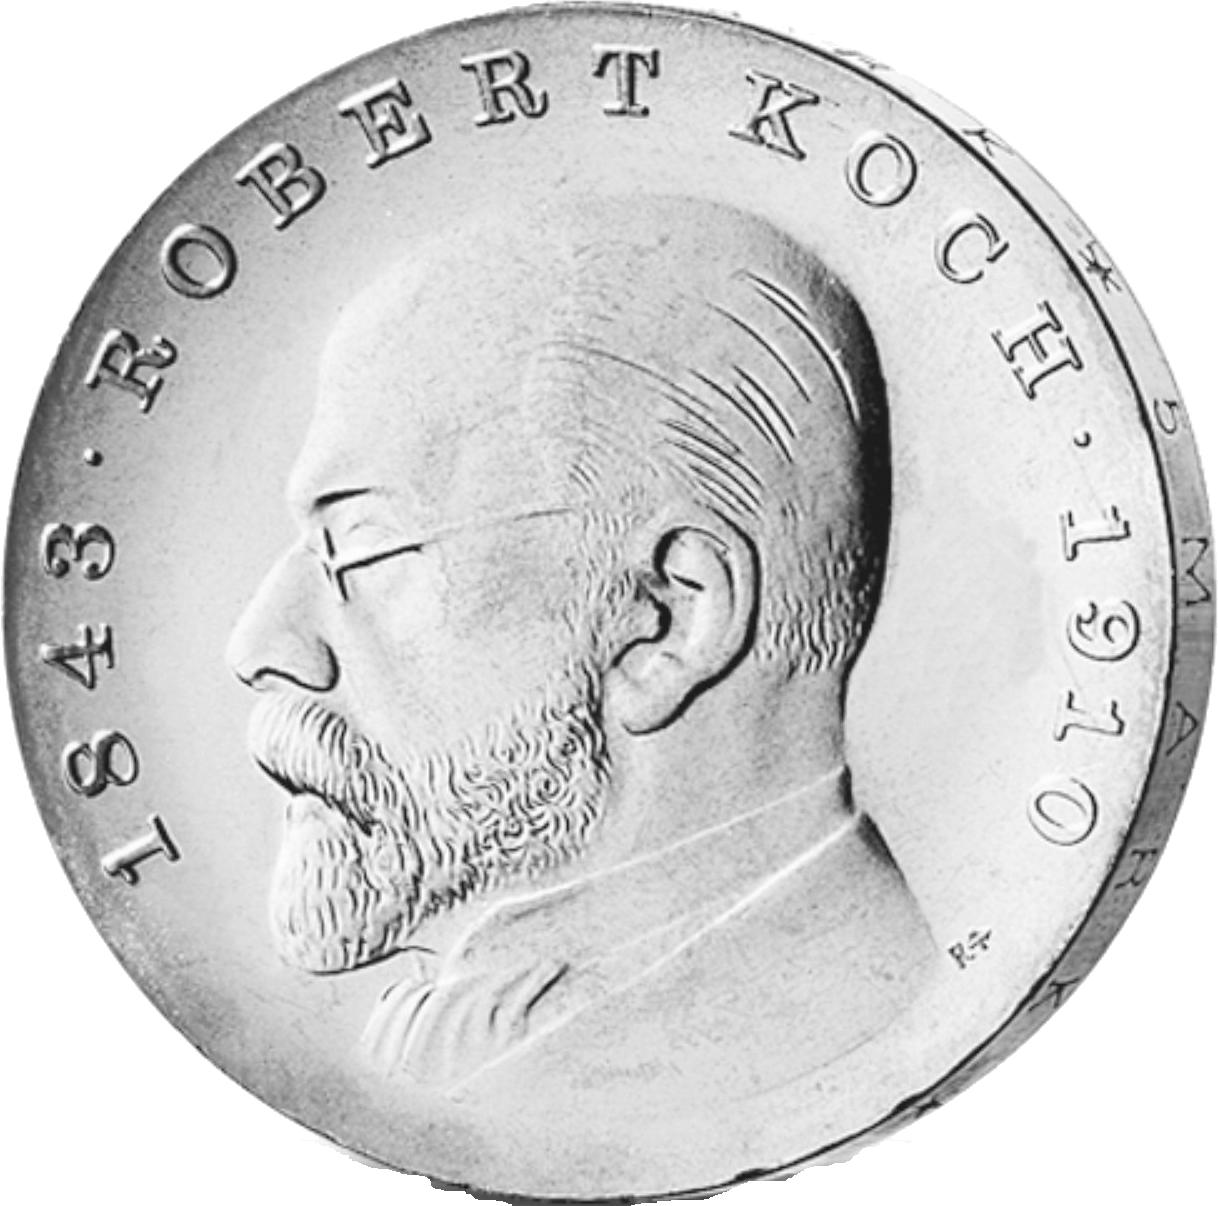 5 Mark Neusilber Koch Ddr 1968 Münzen Günstigerde